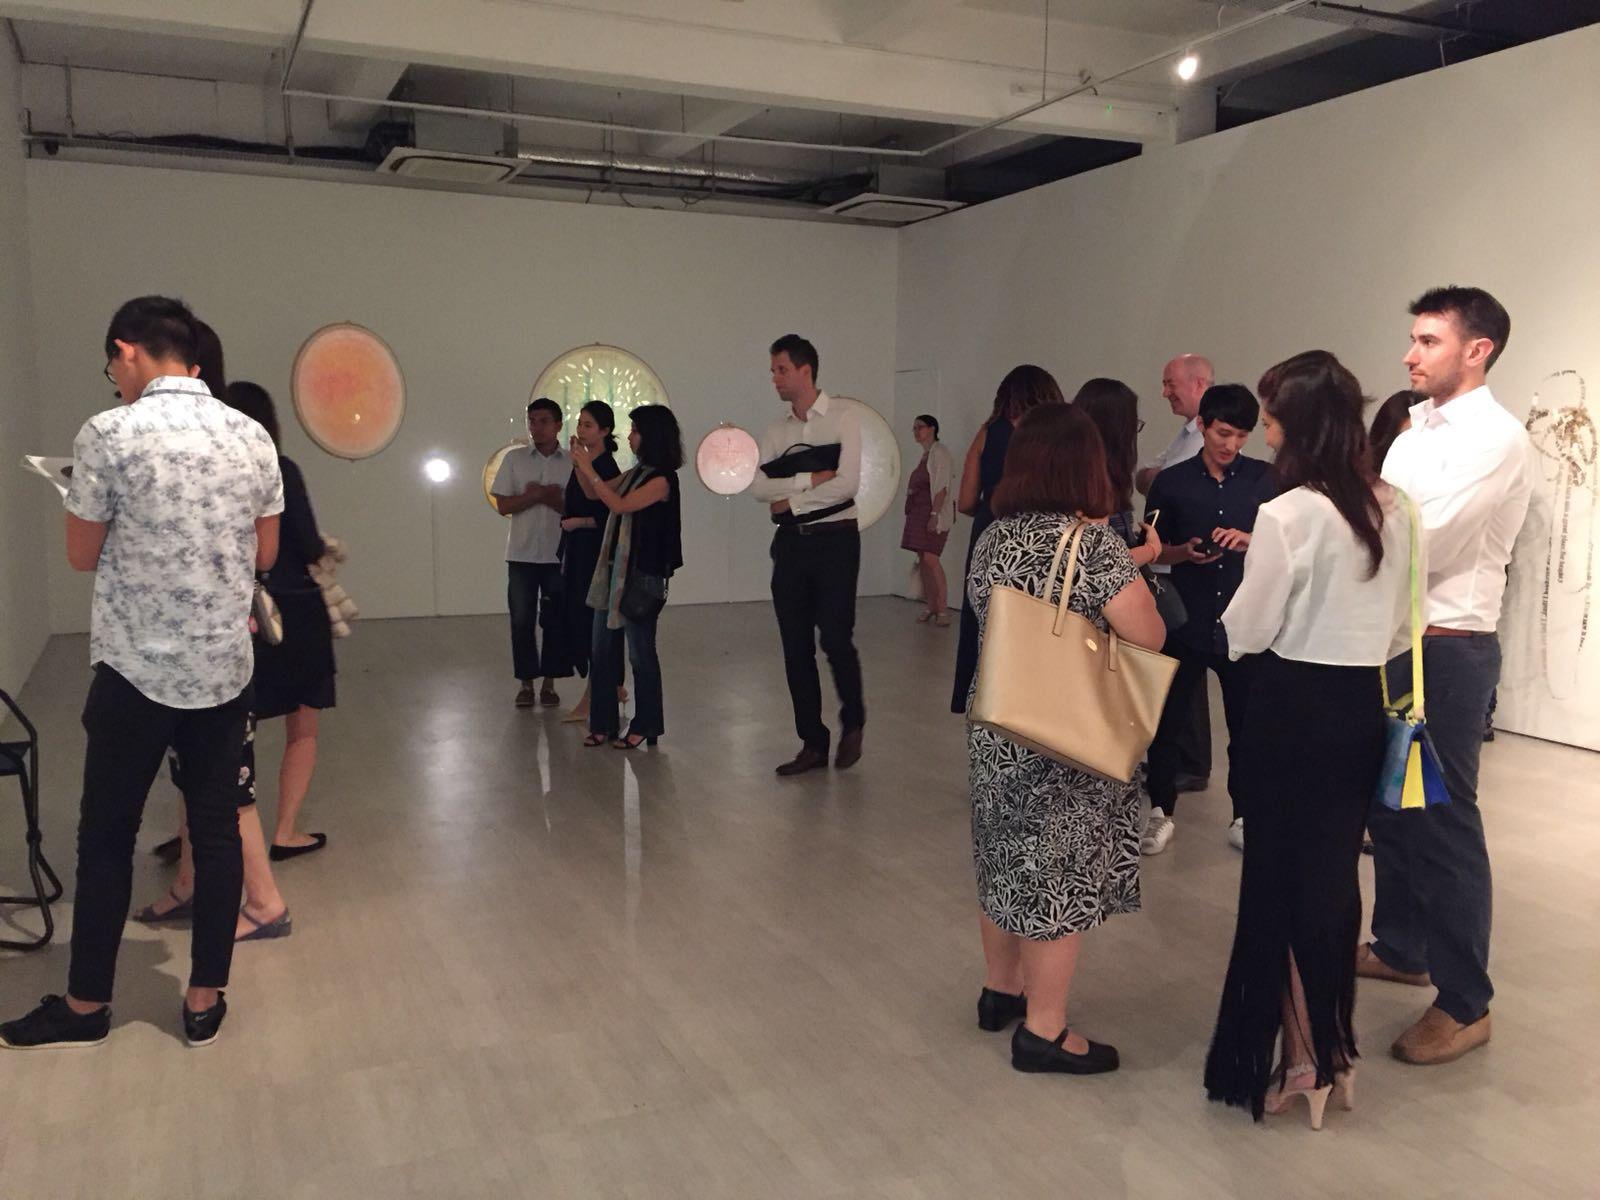 SOLO EXHIBITION OPENING_NICOLA ANTHONY_SINGAPORE ART MUSEUM 5.JPG